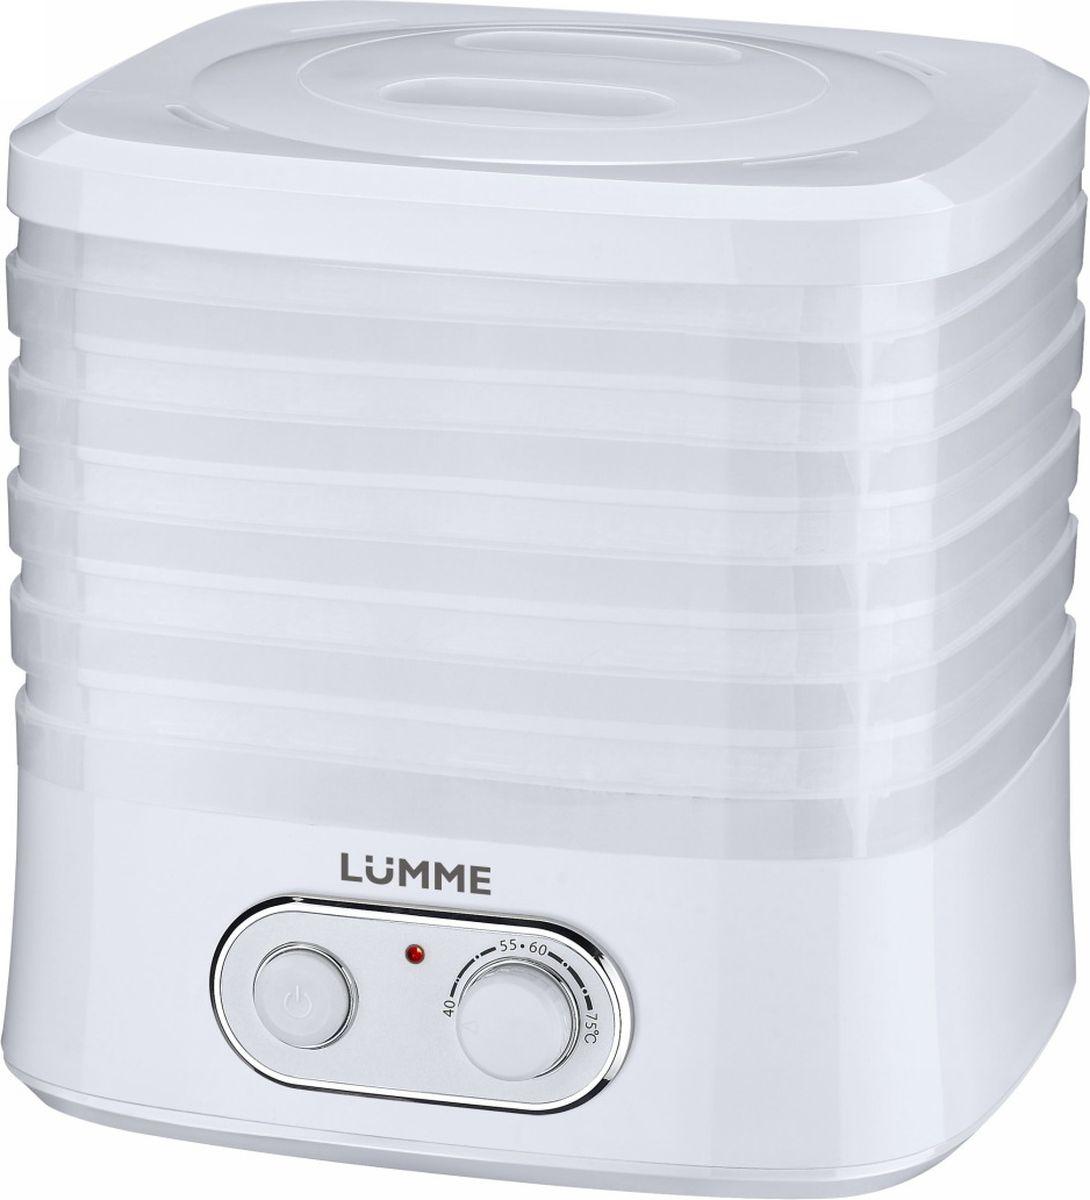 Lumme LU-1853, White Pearl сушилка для фруктов и овощей lumme lu 1319 silver весы кухонные